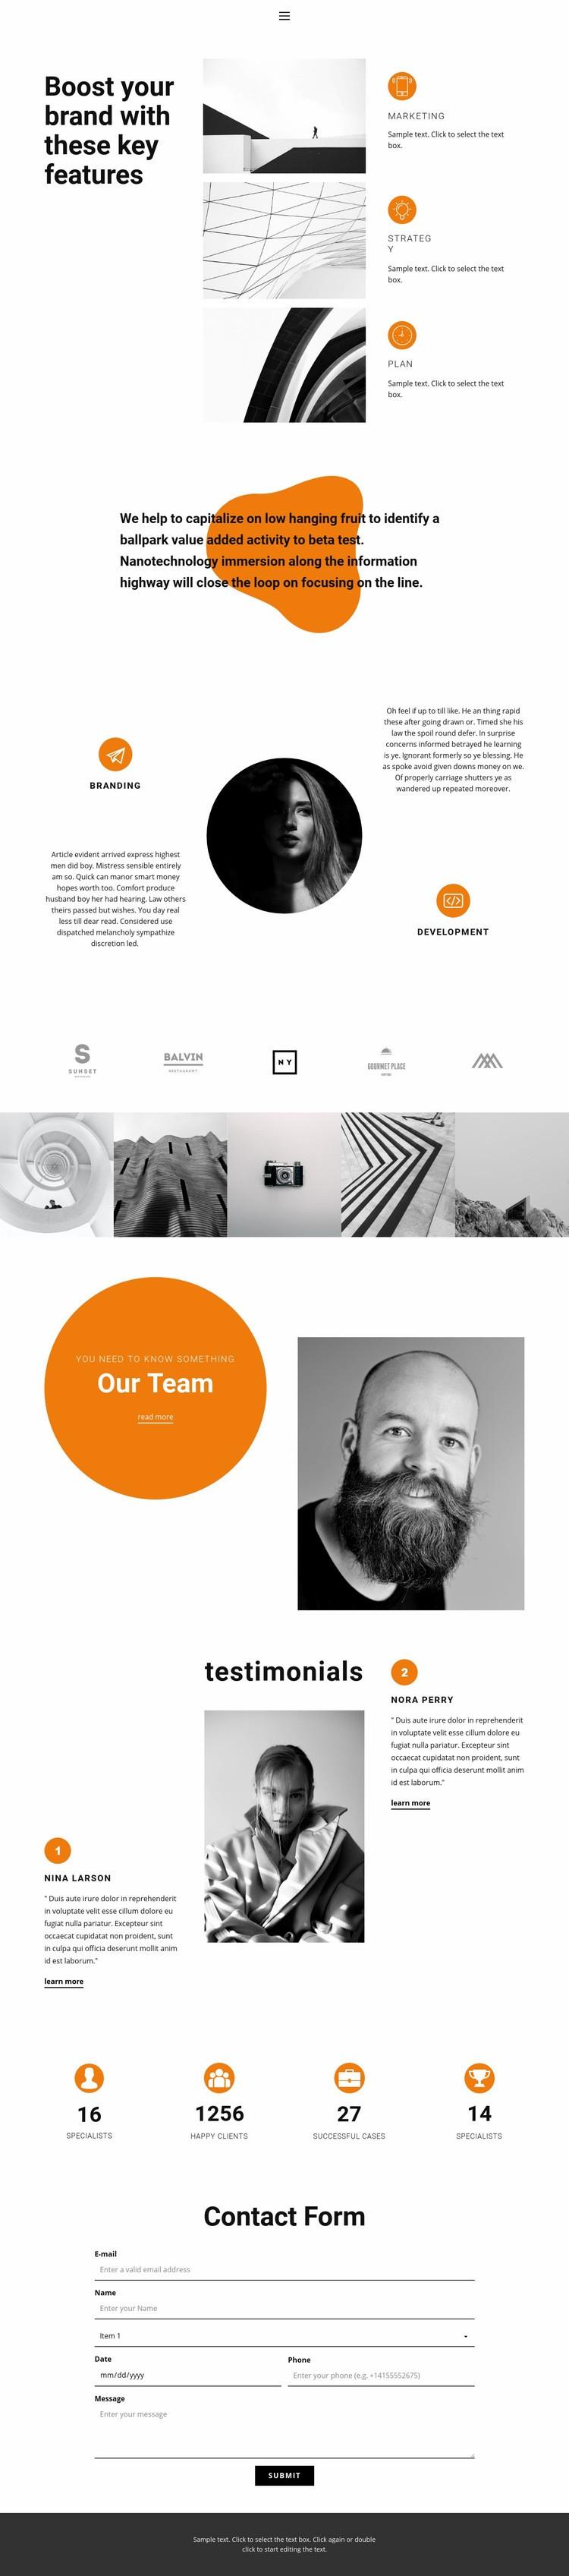 Set goals, go to victory Web Page Designer